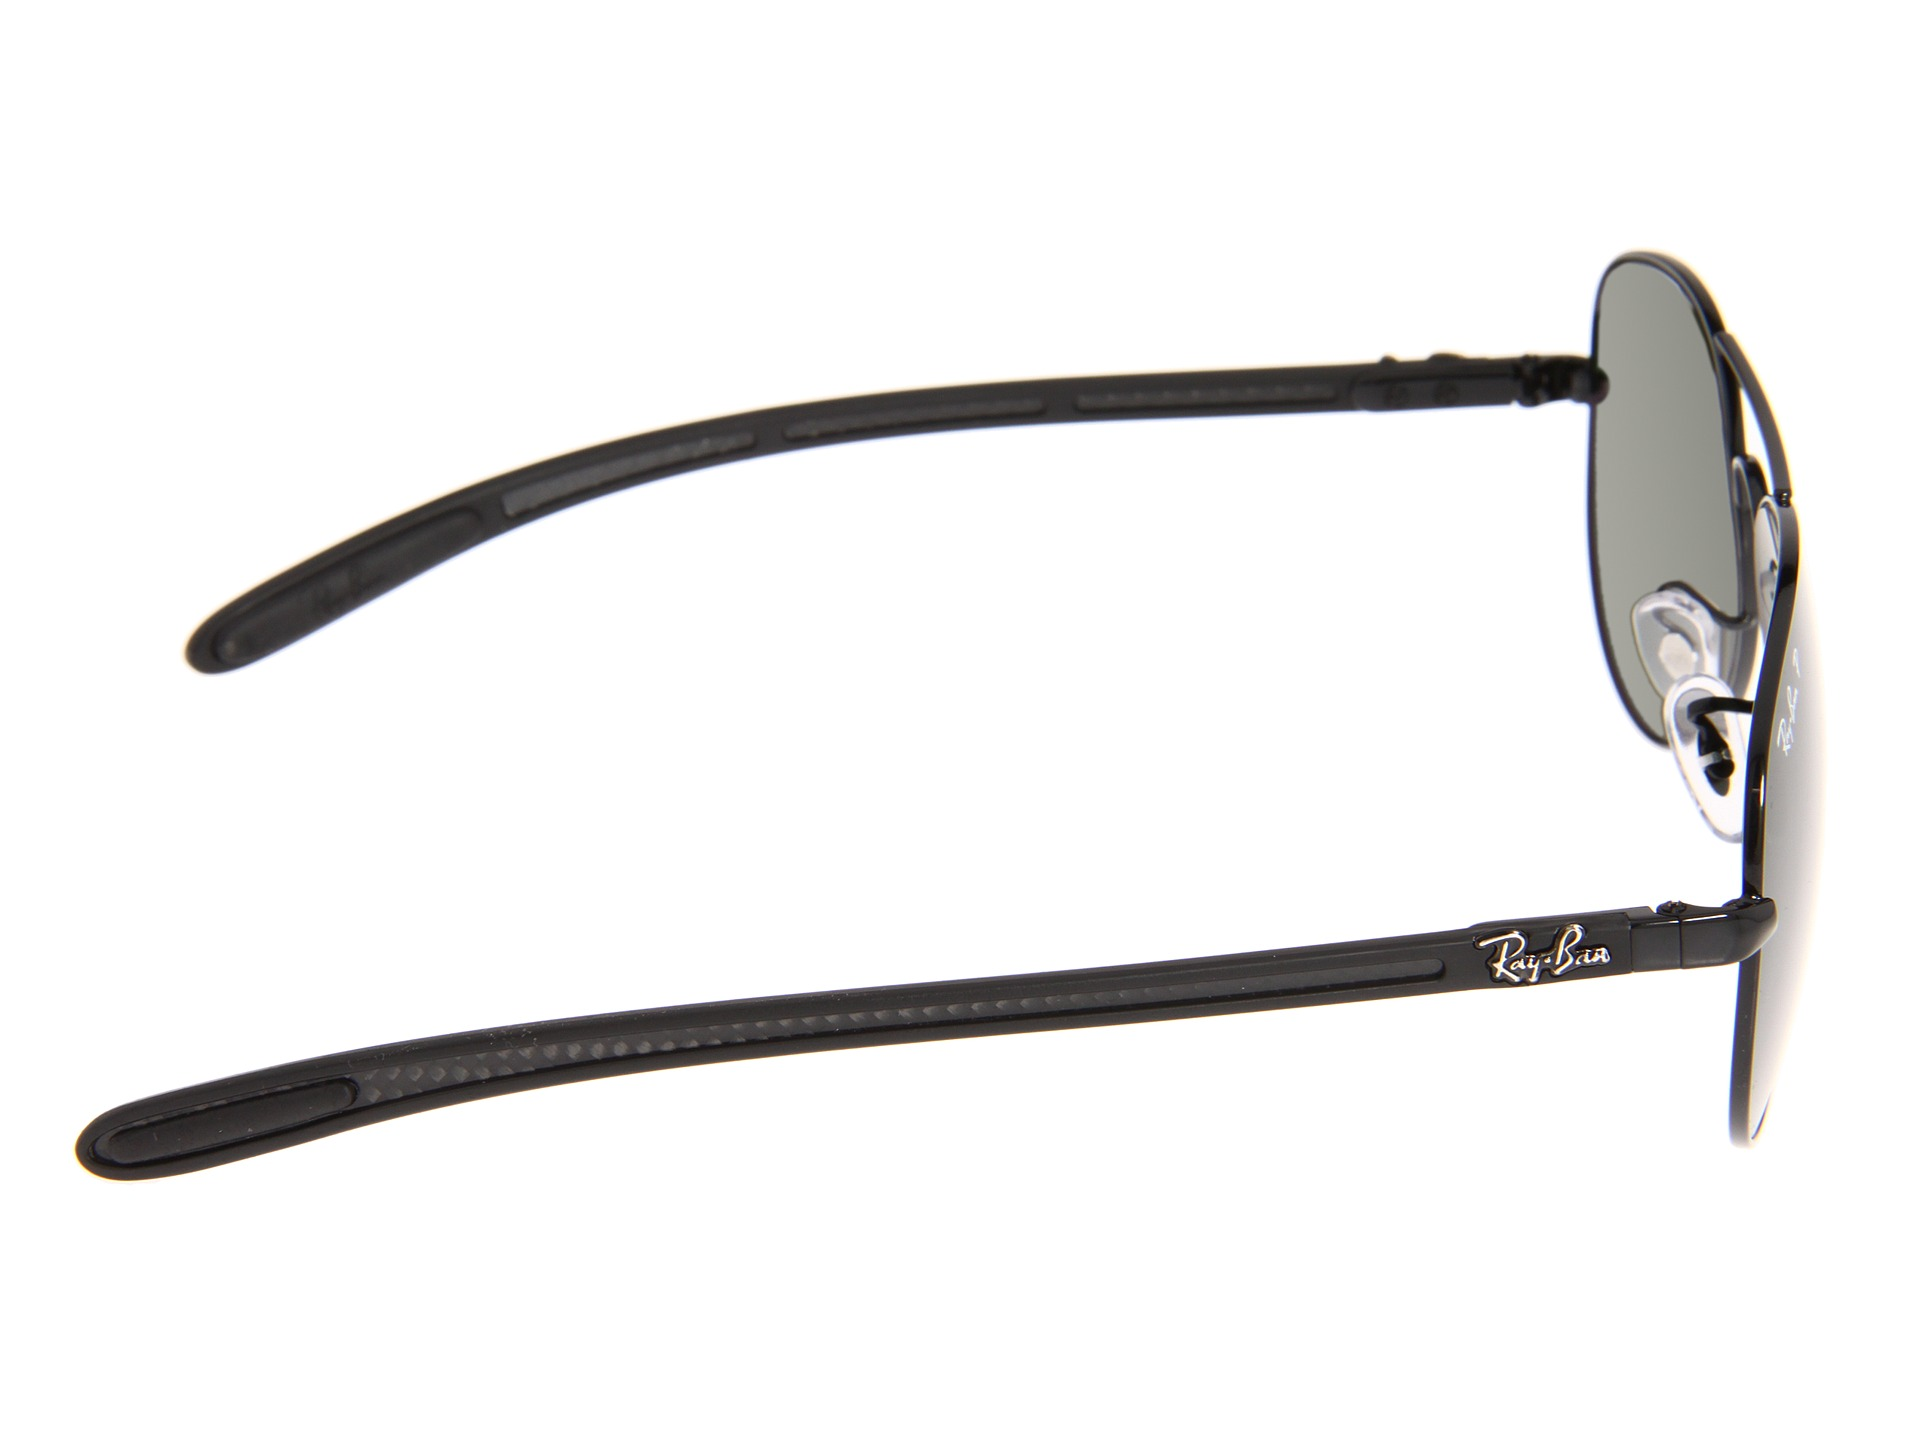 811b1f3fca3 Ray Ban Rb8302 Tech Sunglasses Black Frame Crystal Green Polar ...